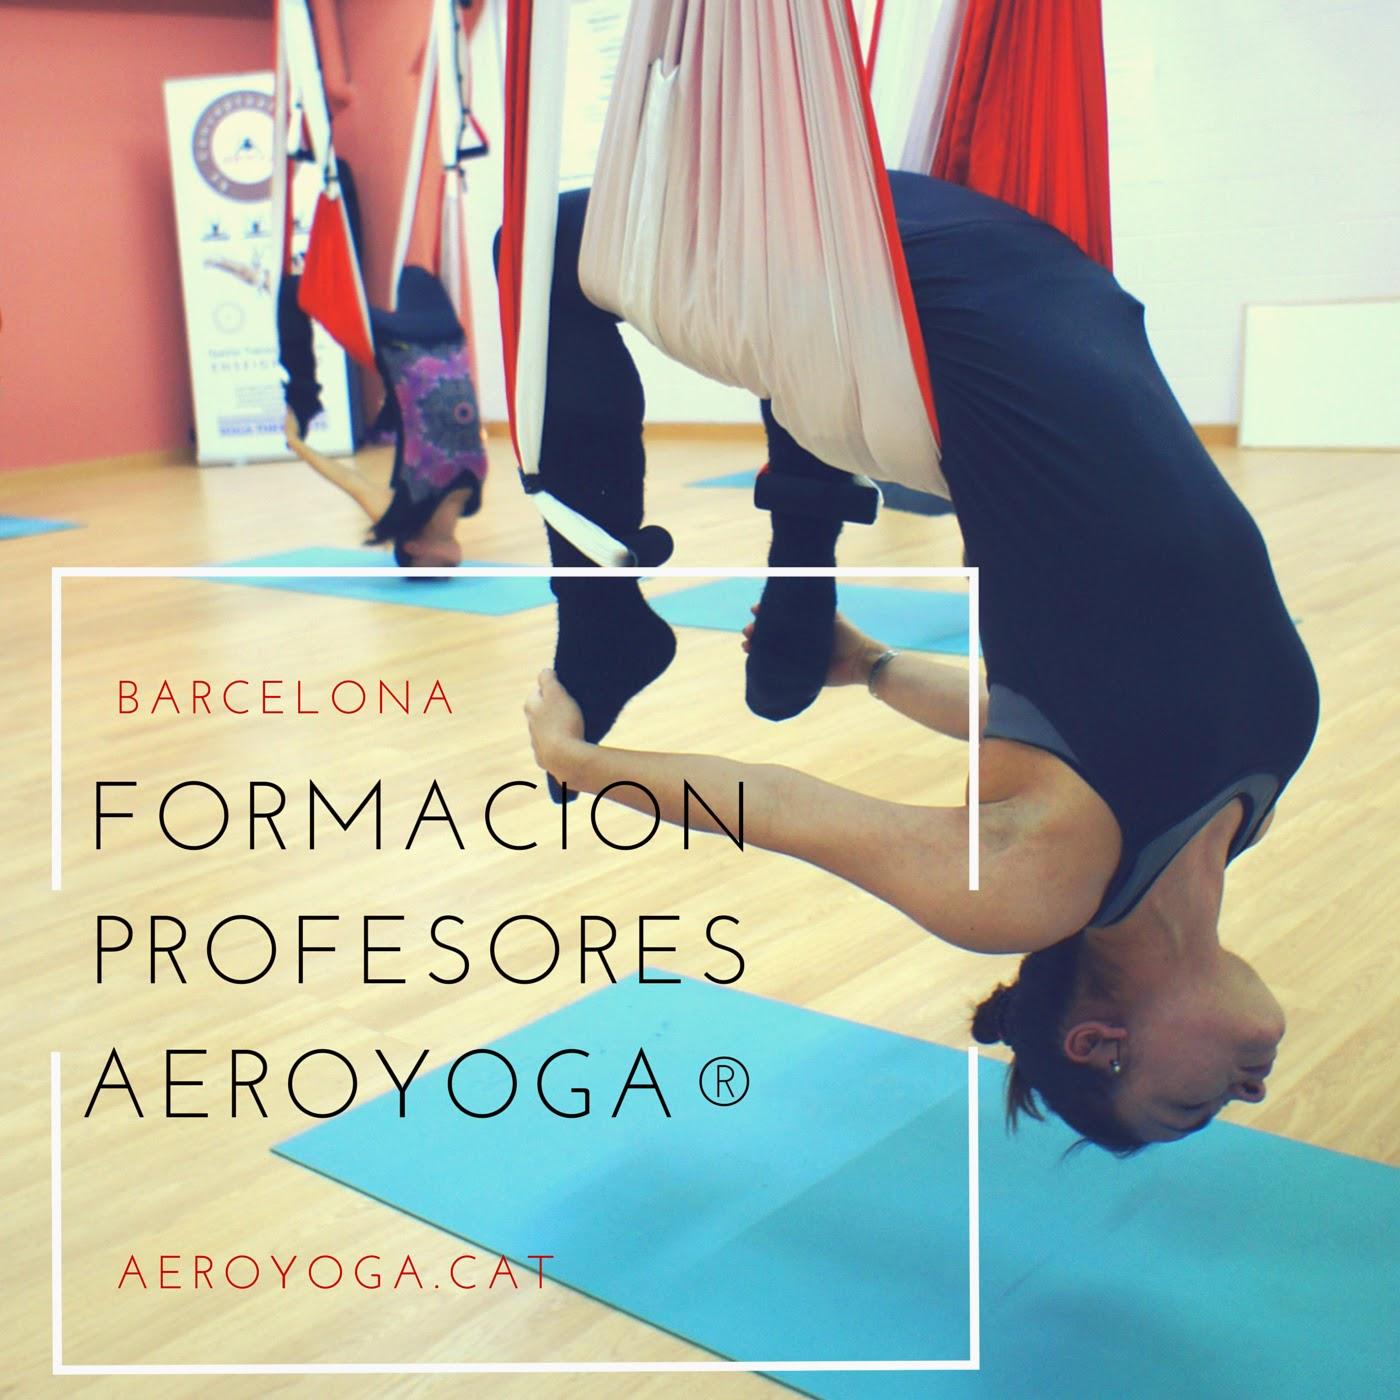 AEROYOGA AEROPILATES